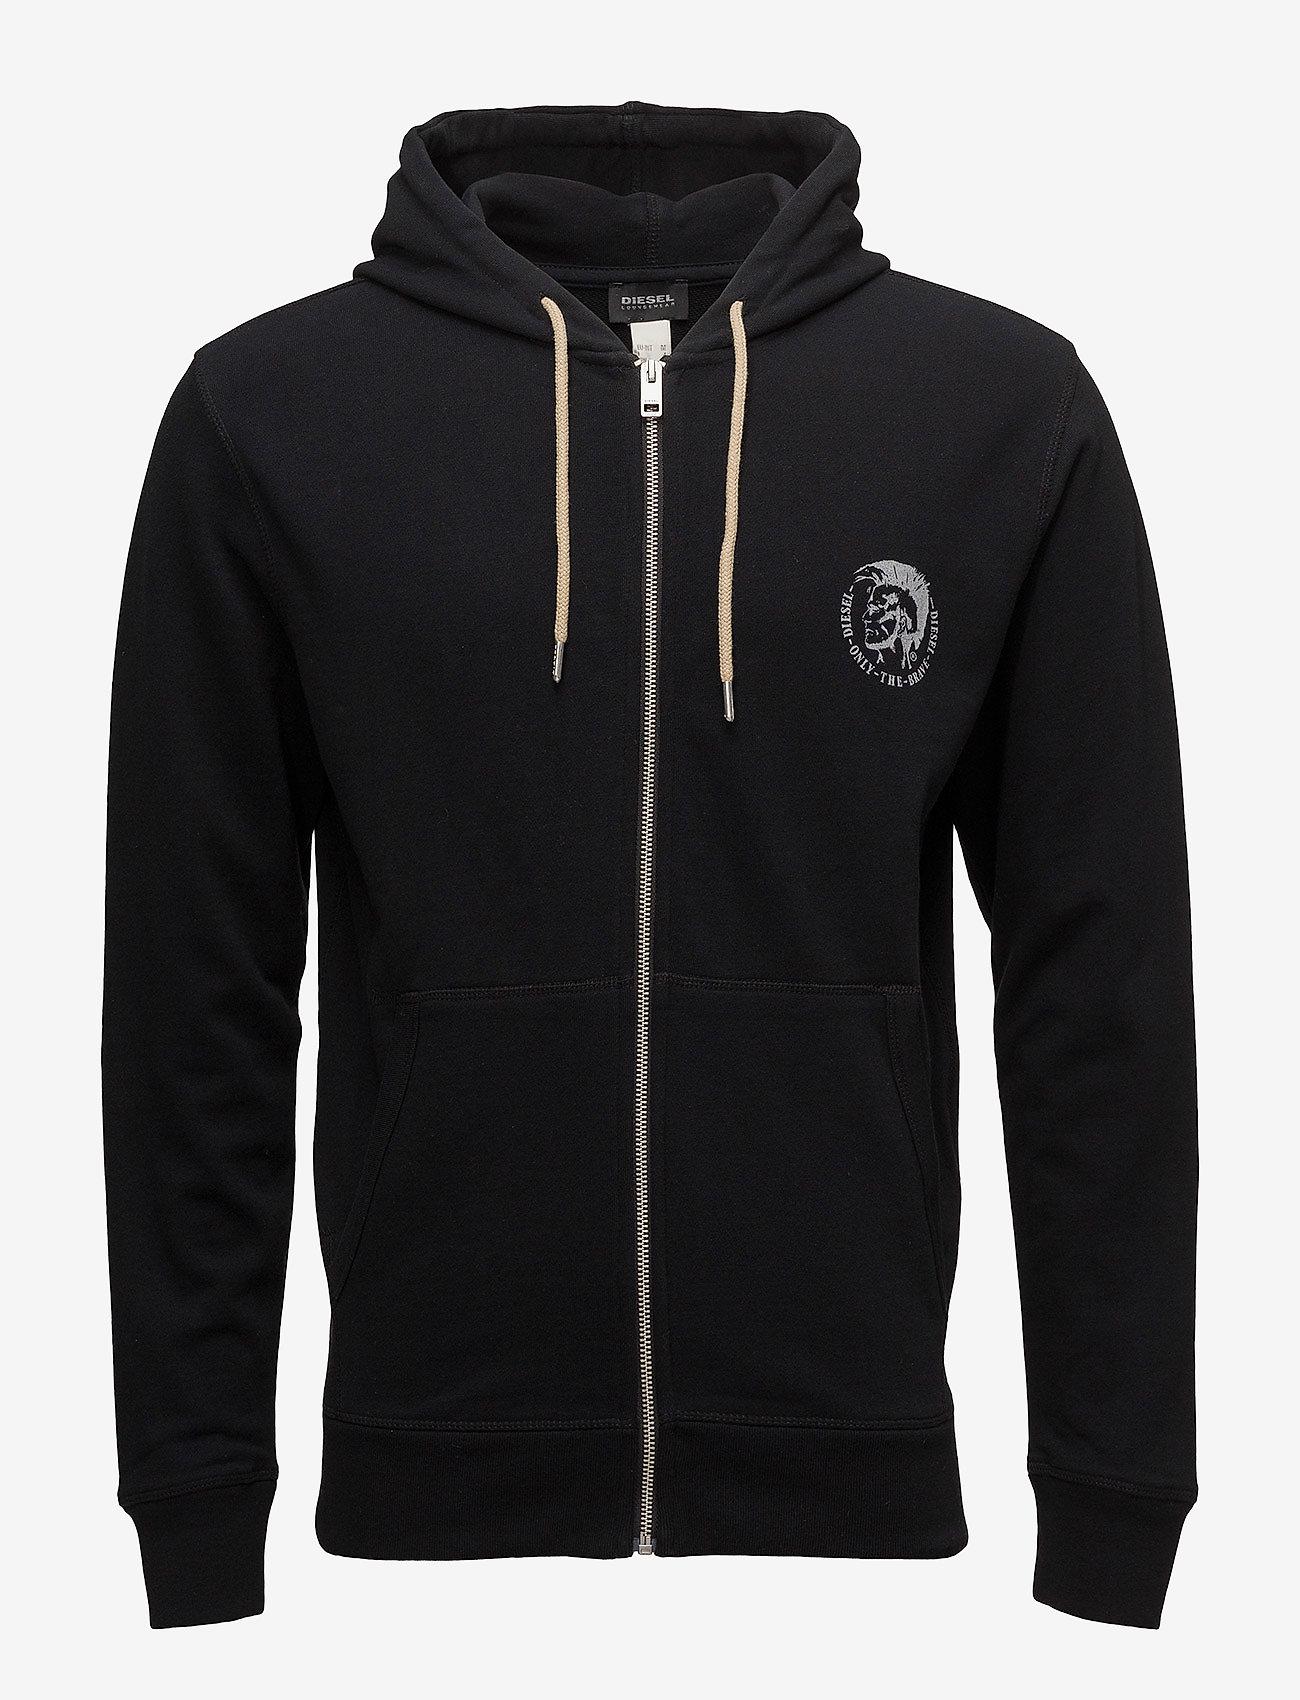 Diesel Men - UMLT-BRANDON-Z  SWEAT-SHIRT - hoodies - black - 0